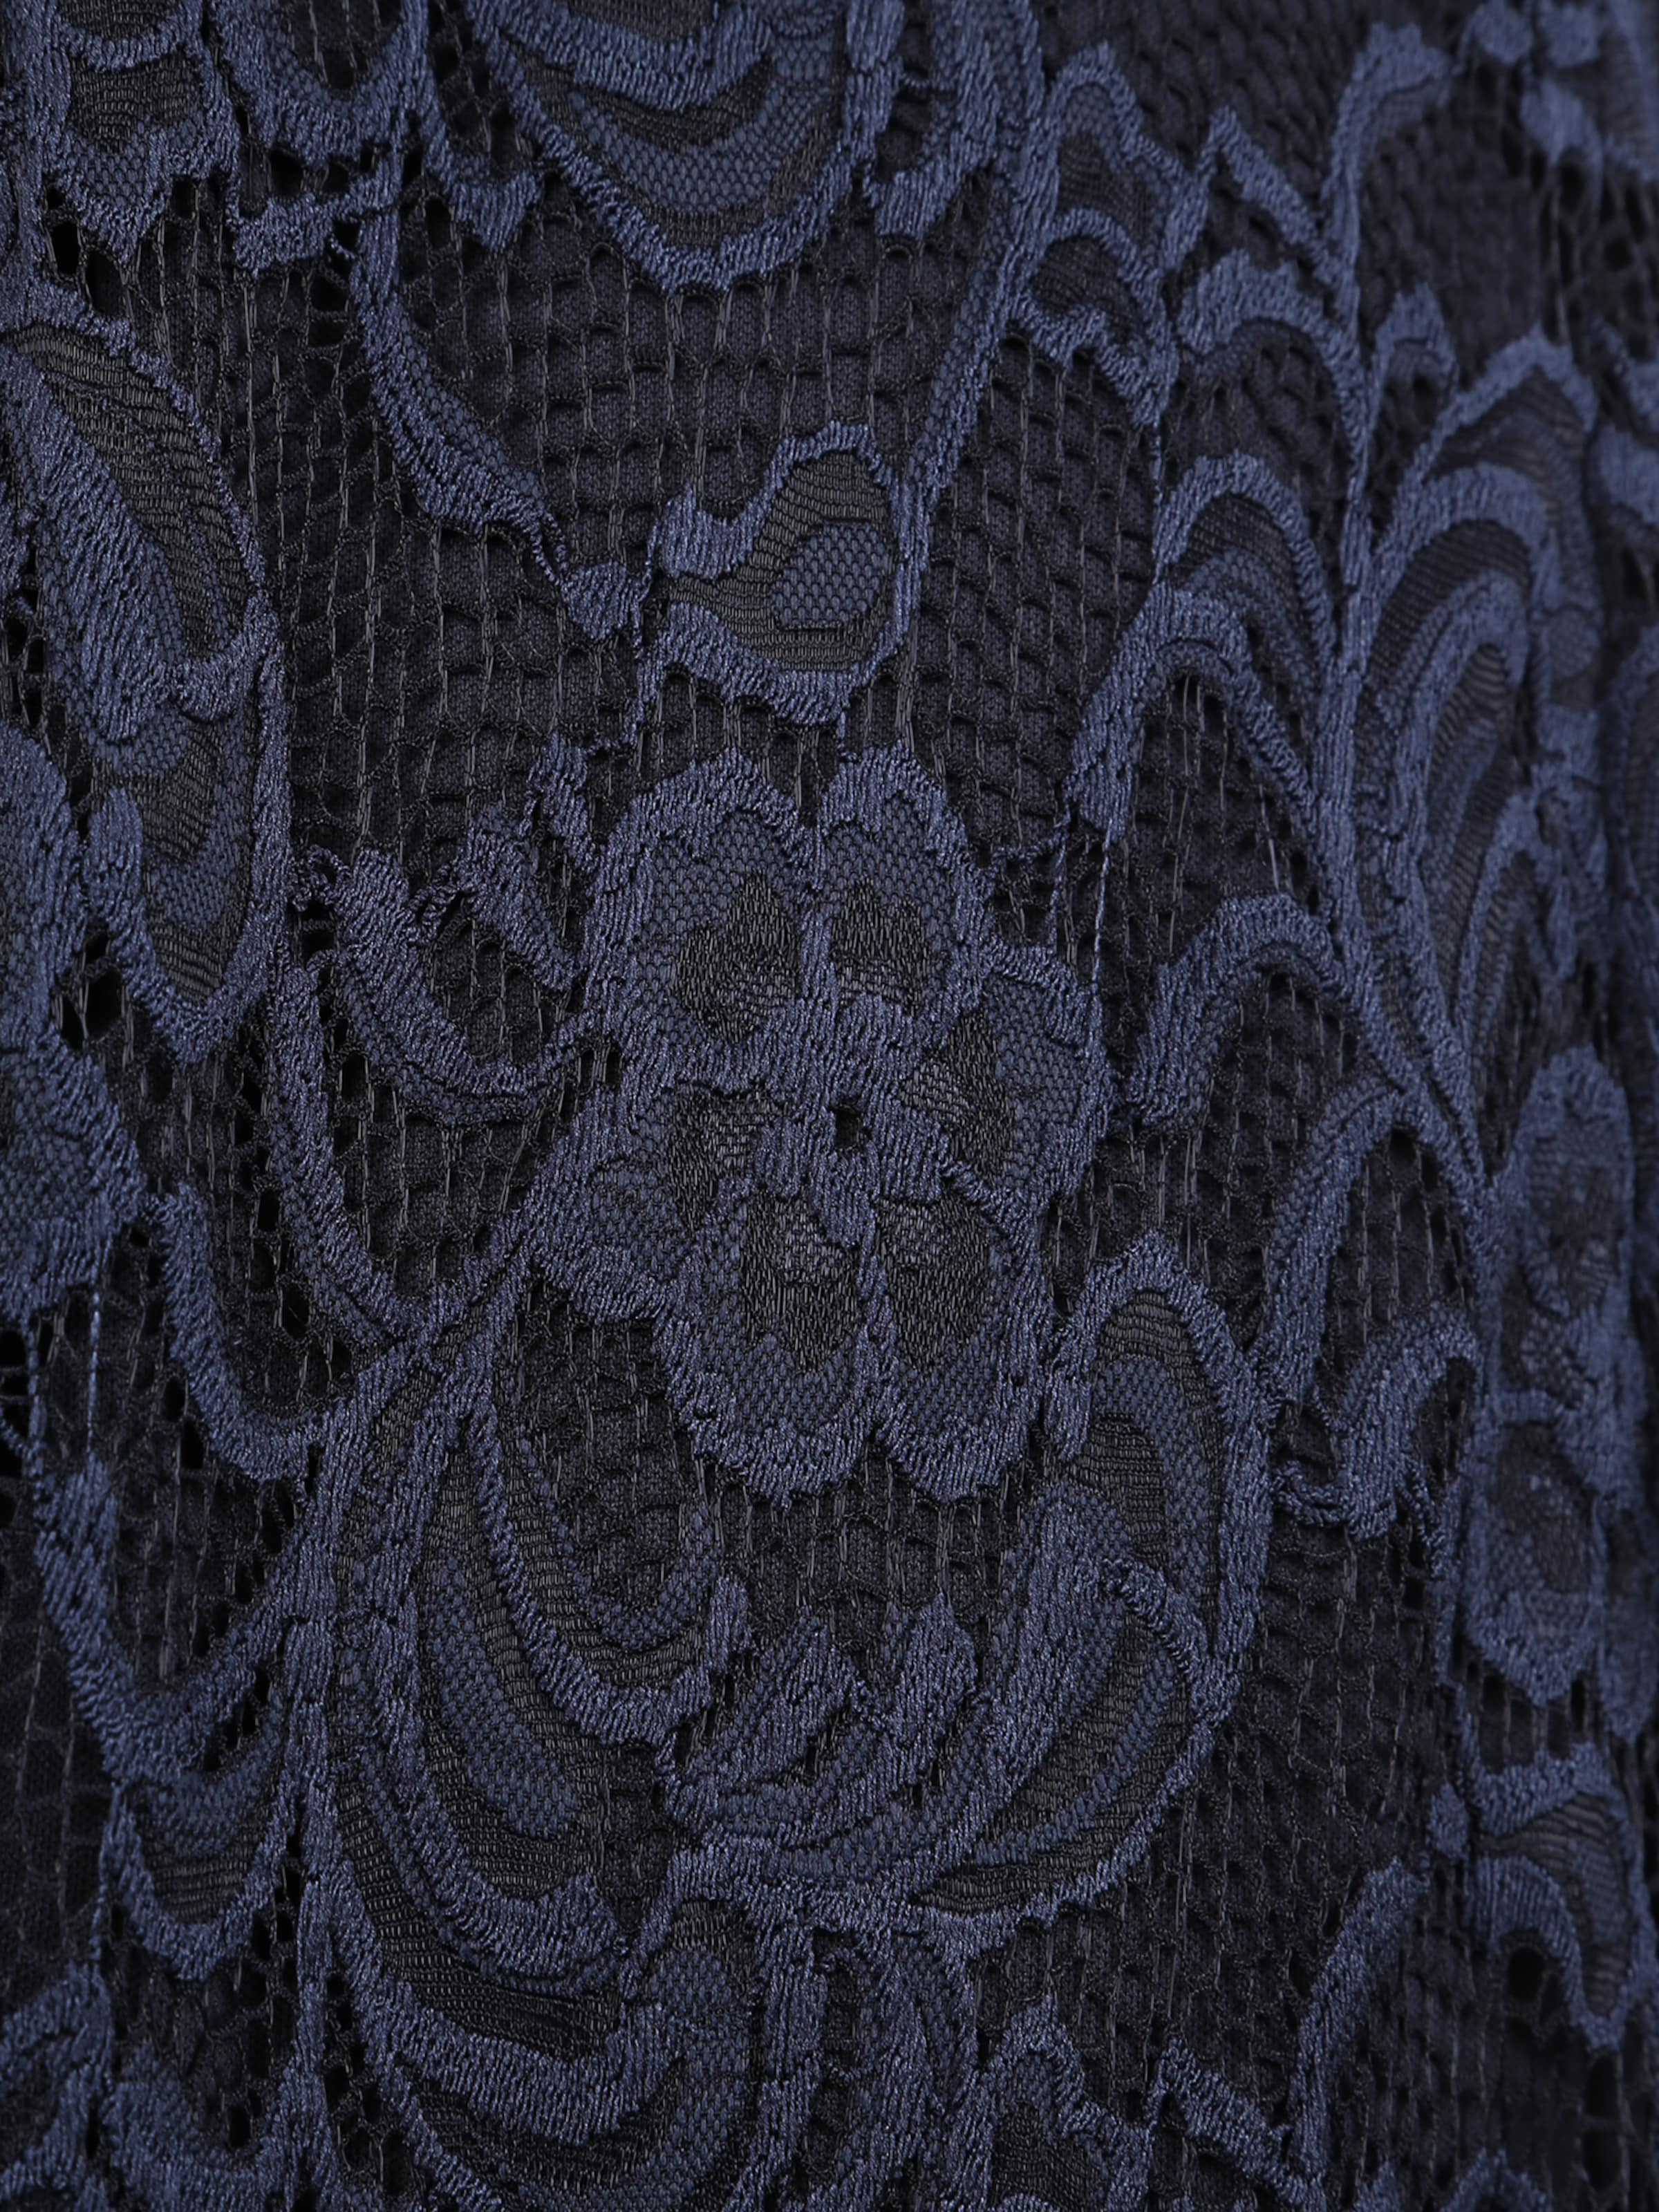 Cocktail Knee Junarose Foncé De Dress' Bleu Above 3 Sl 'jrnewemma 4 En Robe BdexoWrC